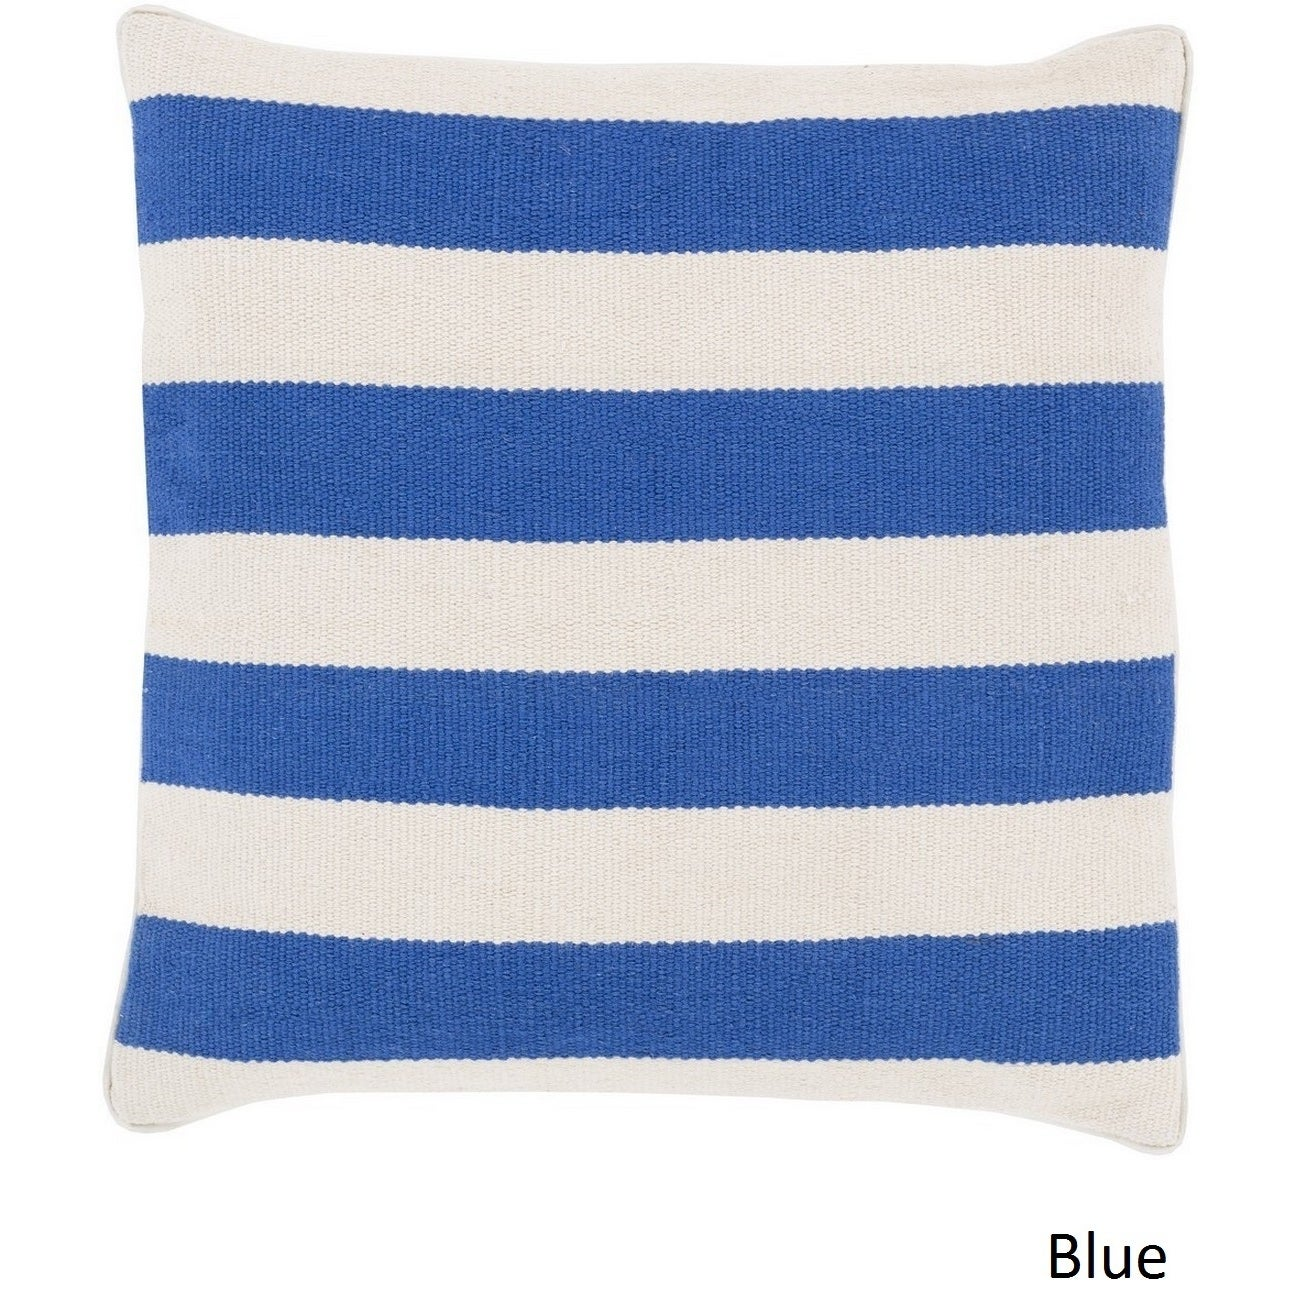 Decorative Redditch 20-inch Stripe Pillow Cover | eBay